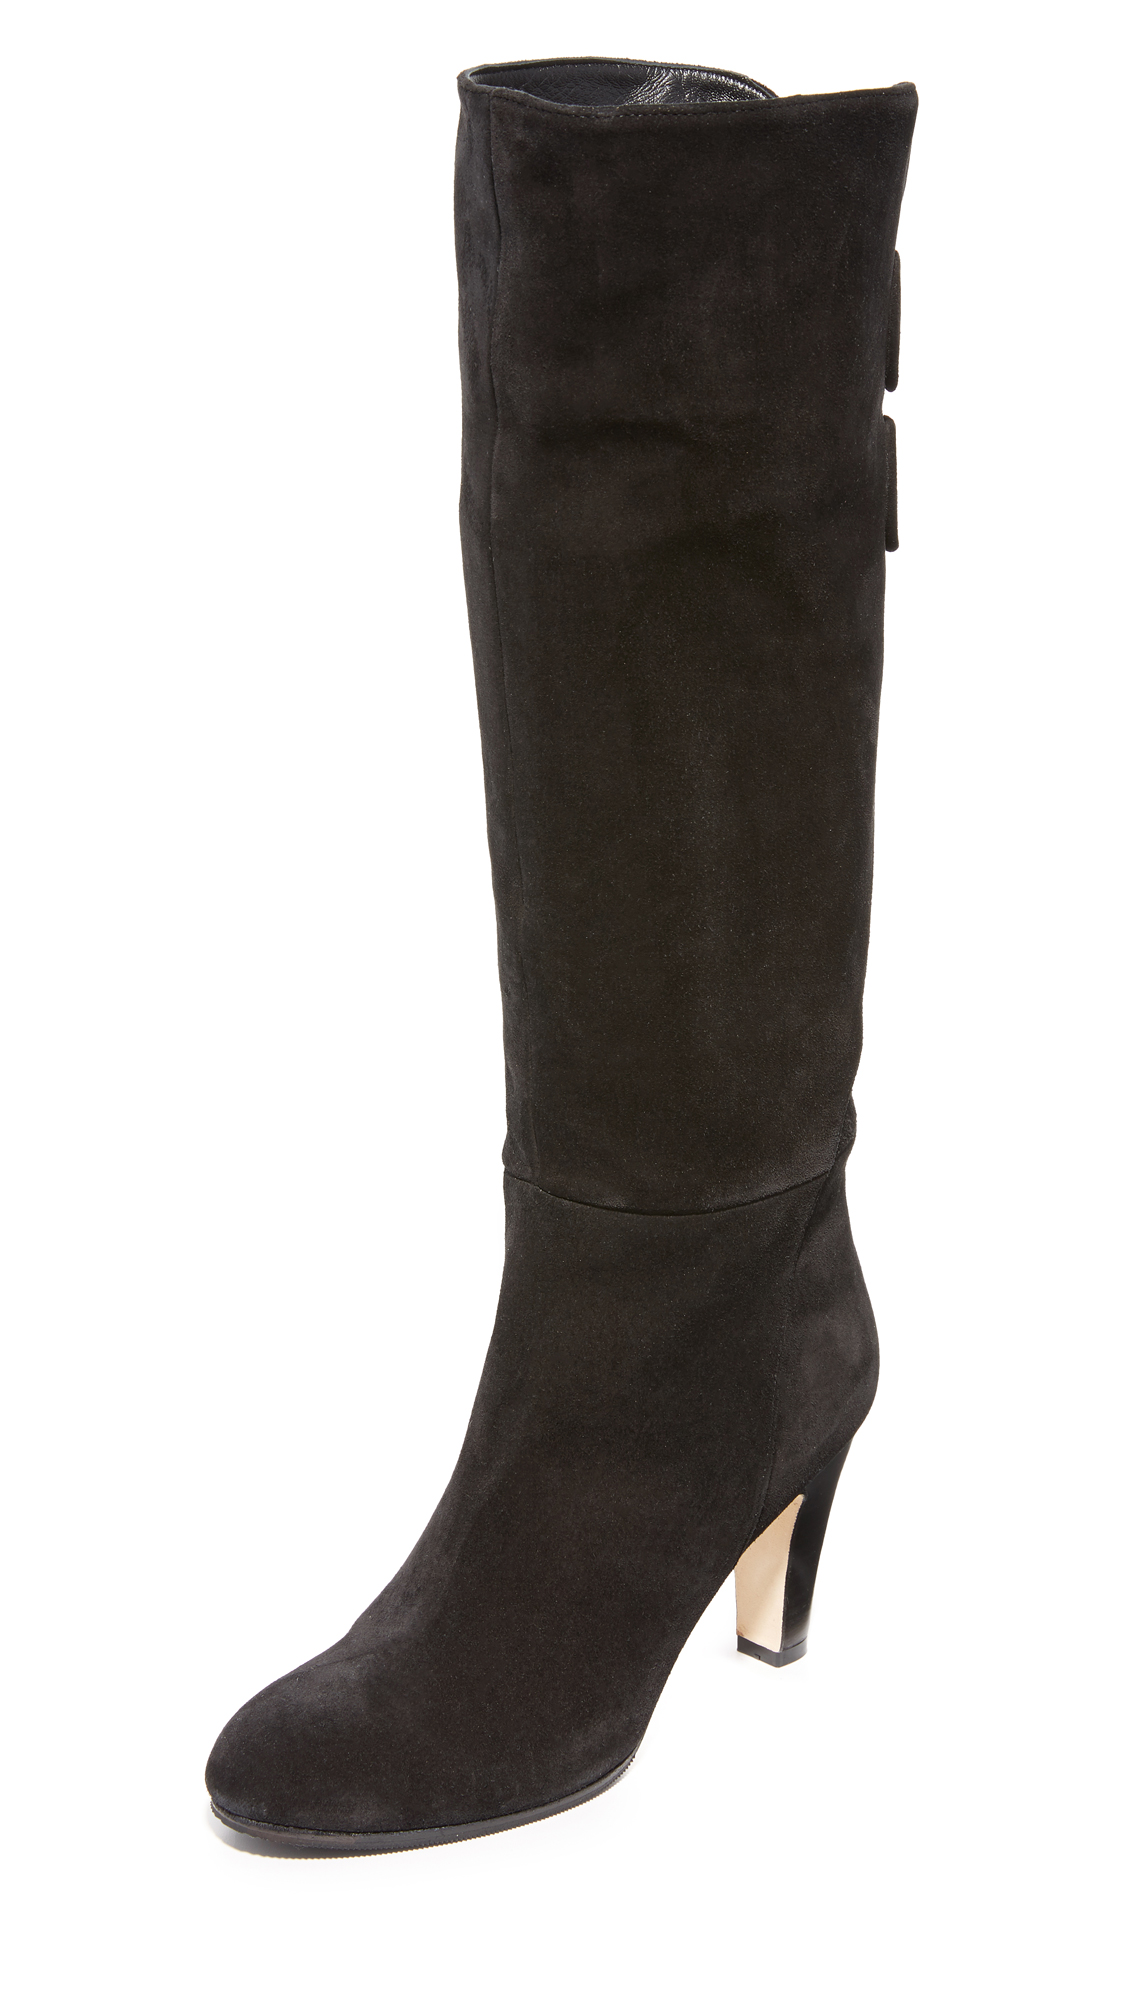 Sarah Flint Marina Boots - Black